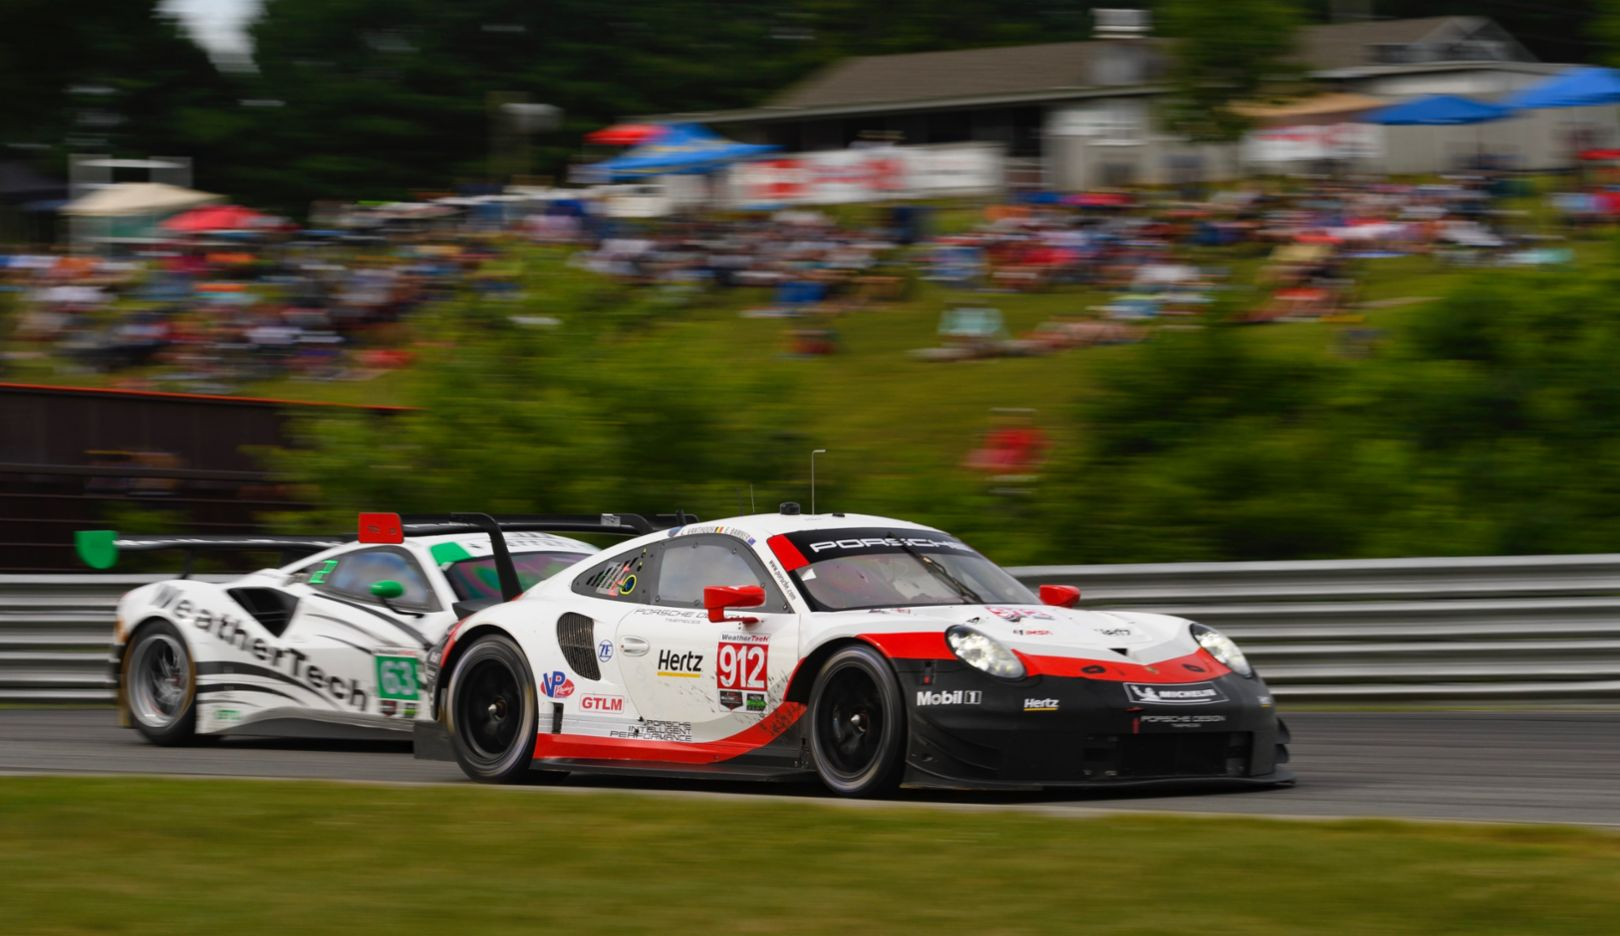 911 RSR, IMSA WeatherTech SportsCar Championship, Lime Rock Park, race, 2018, Porsche AG